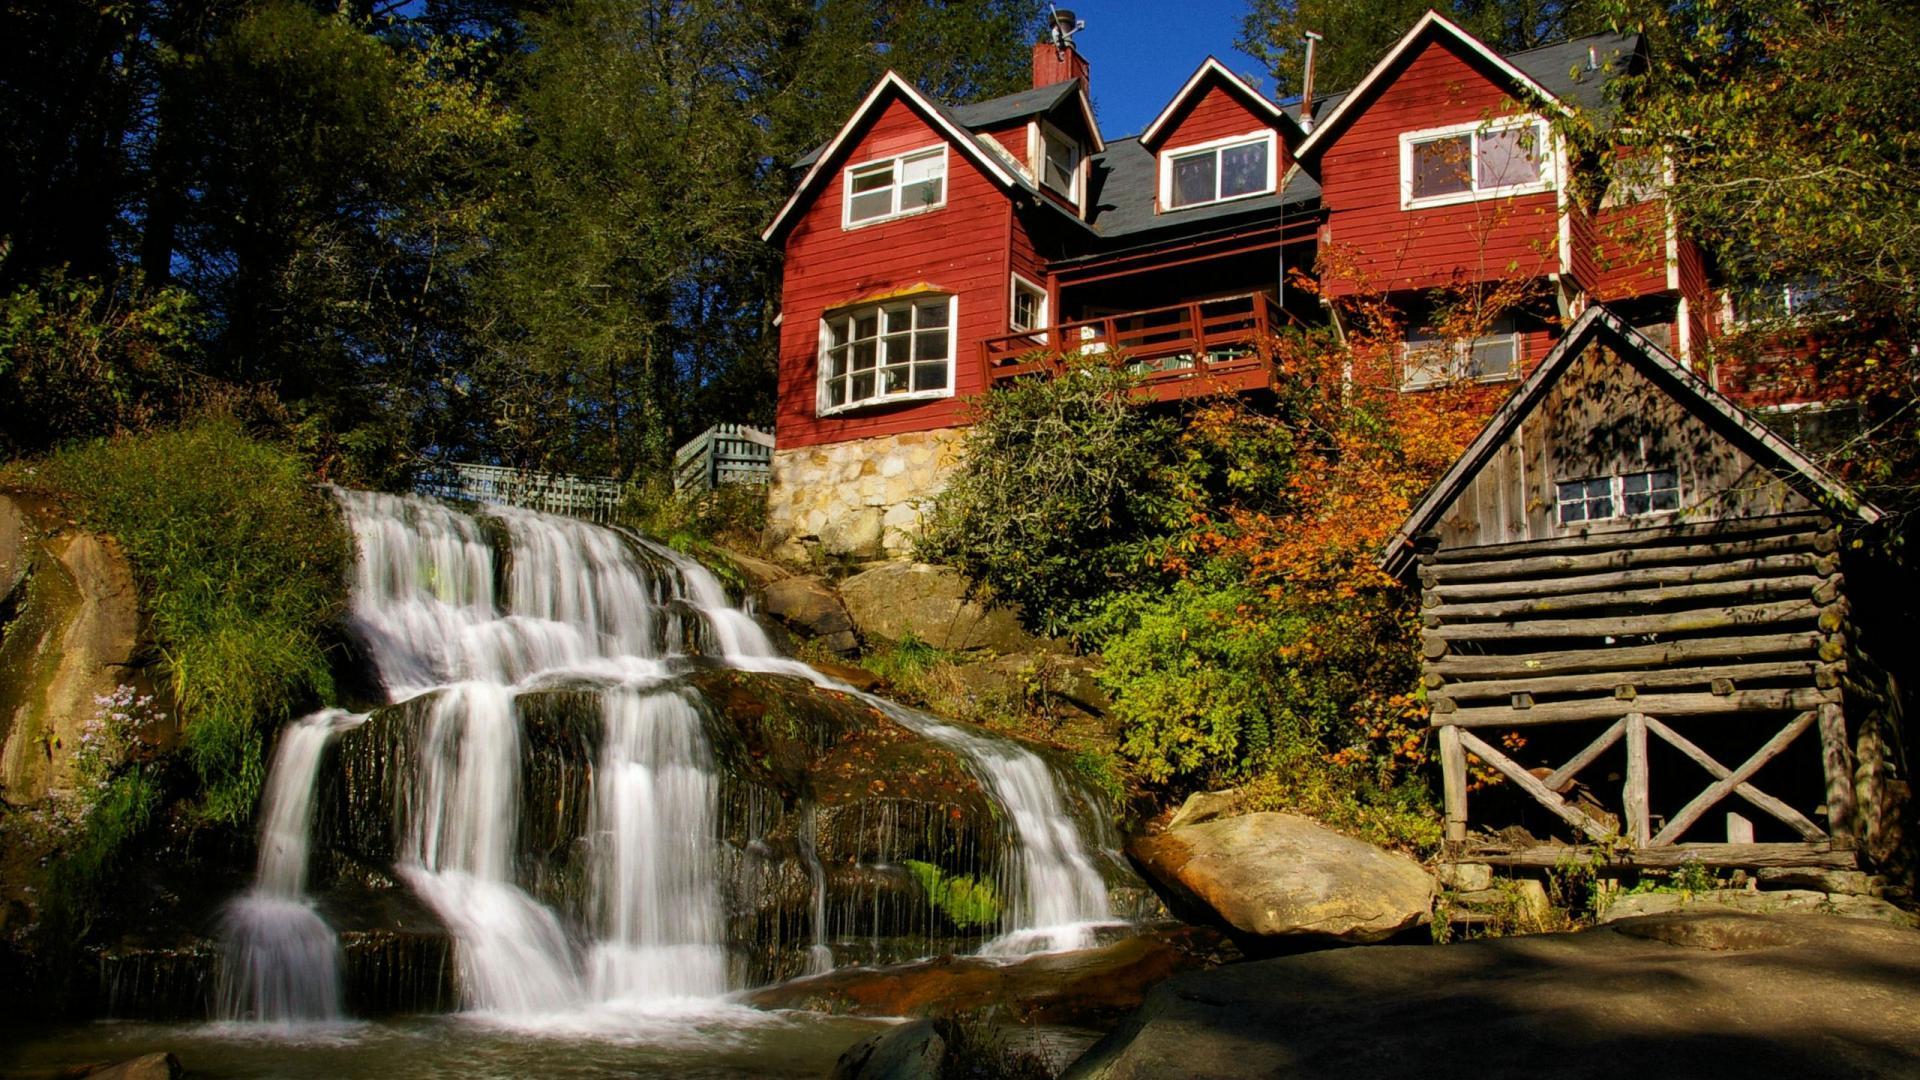 Waterfall House HD wallpaper